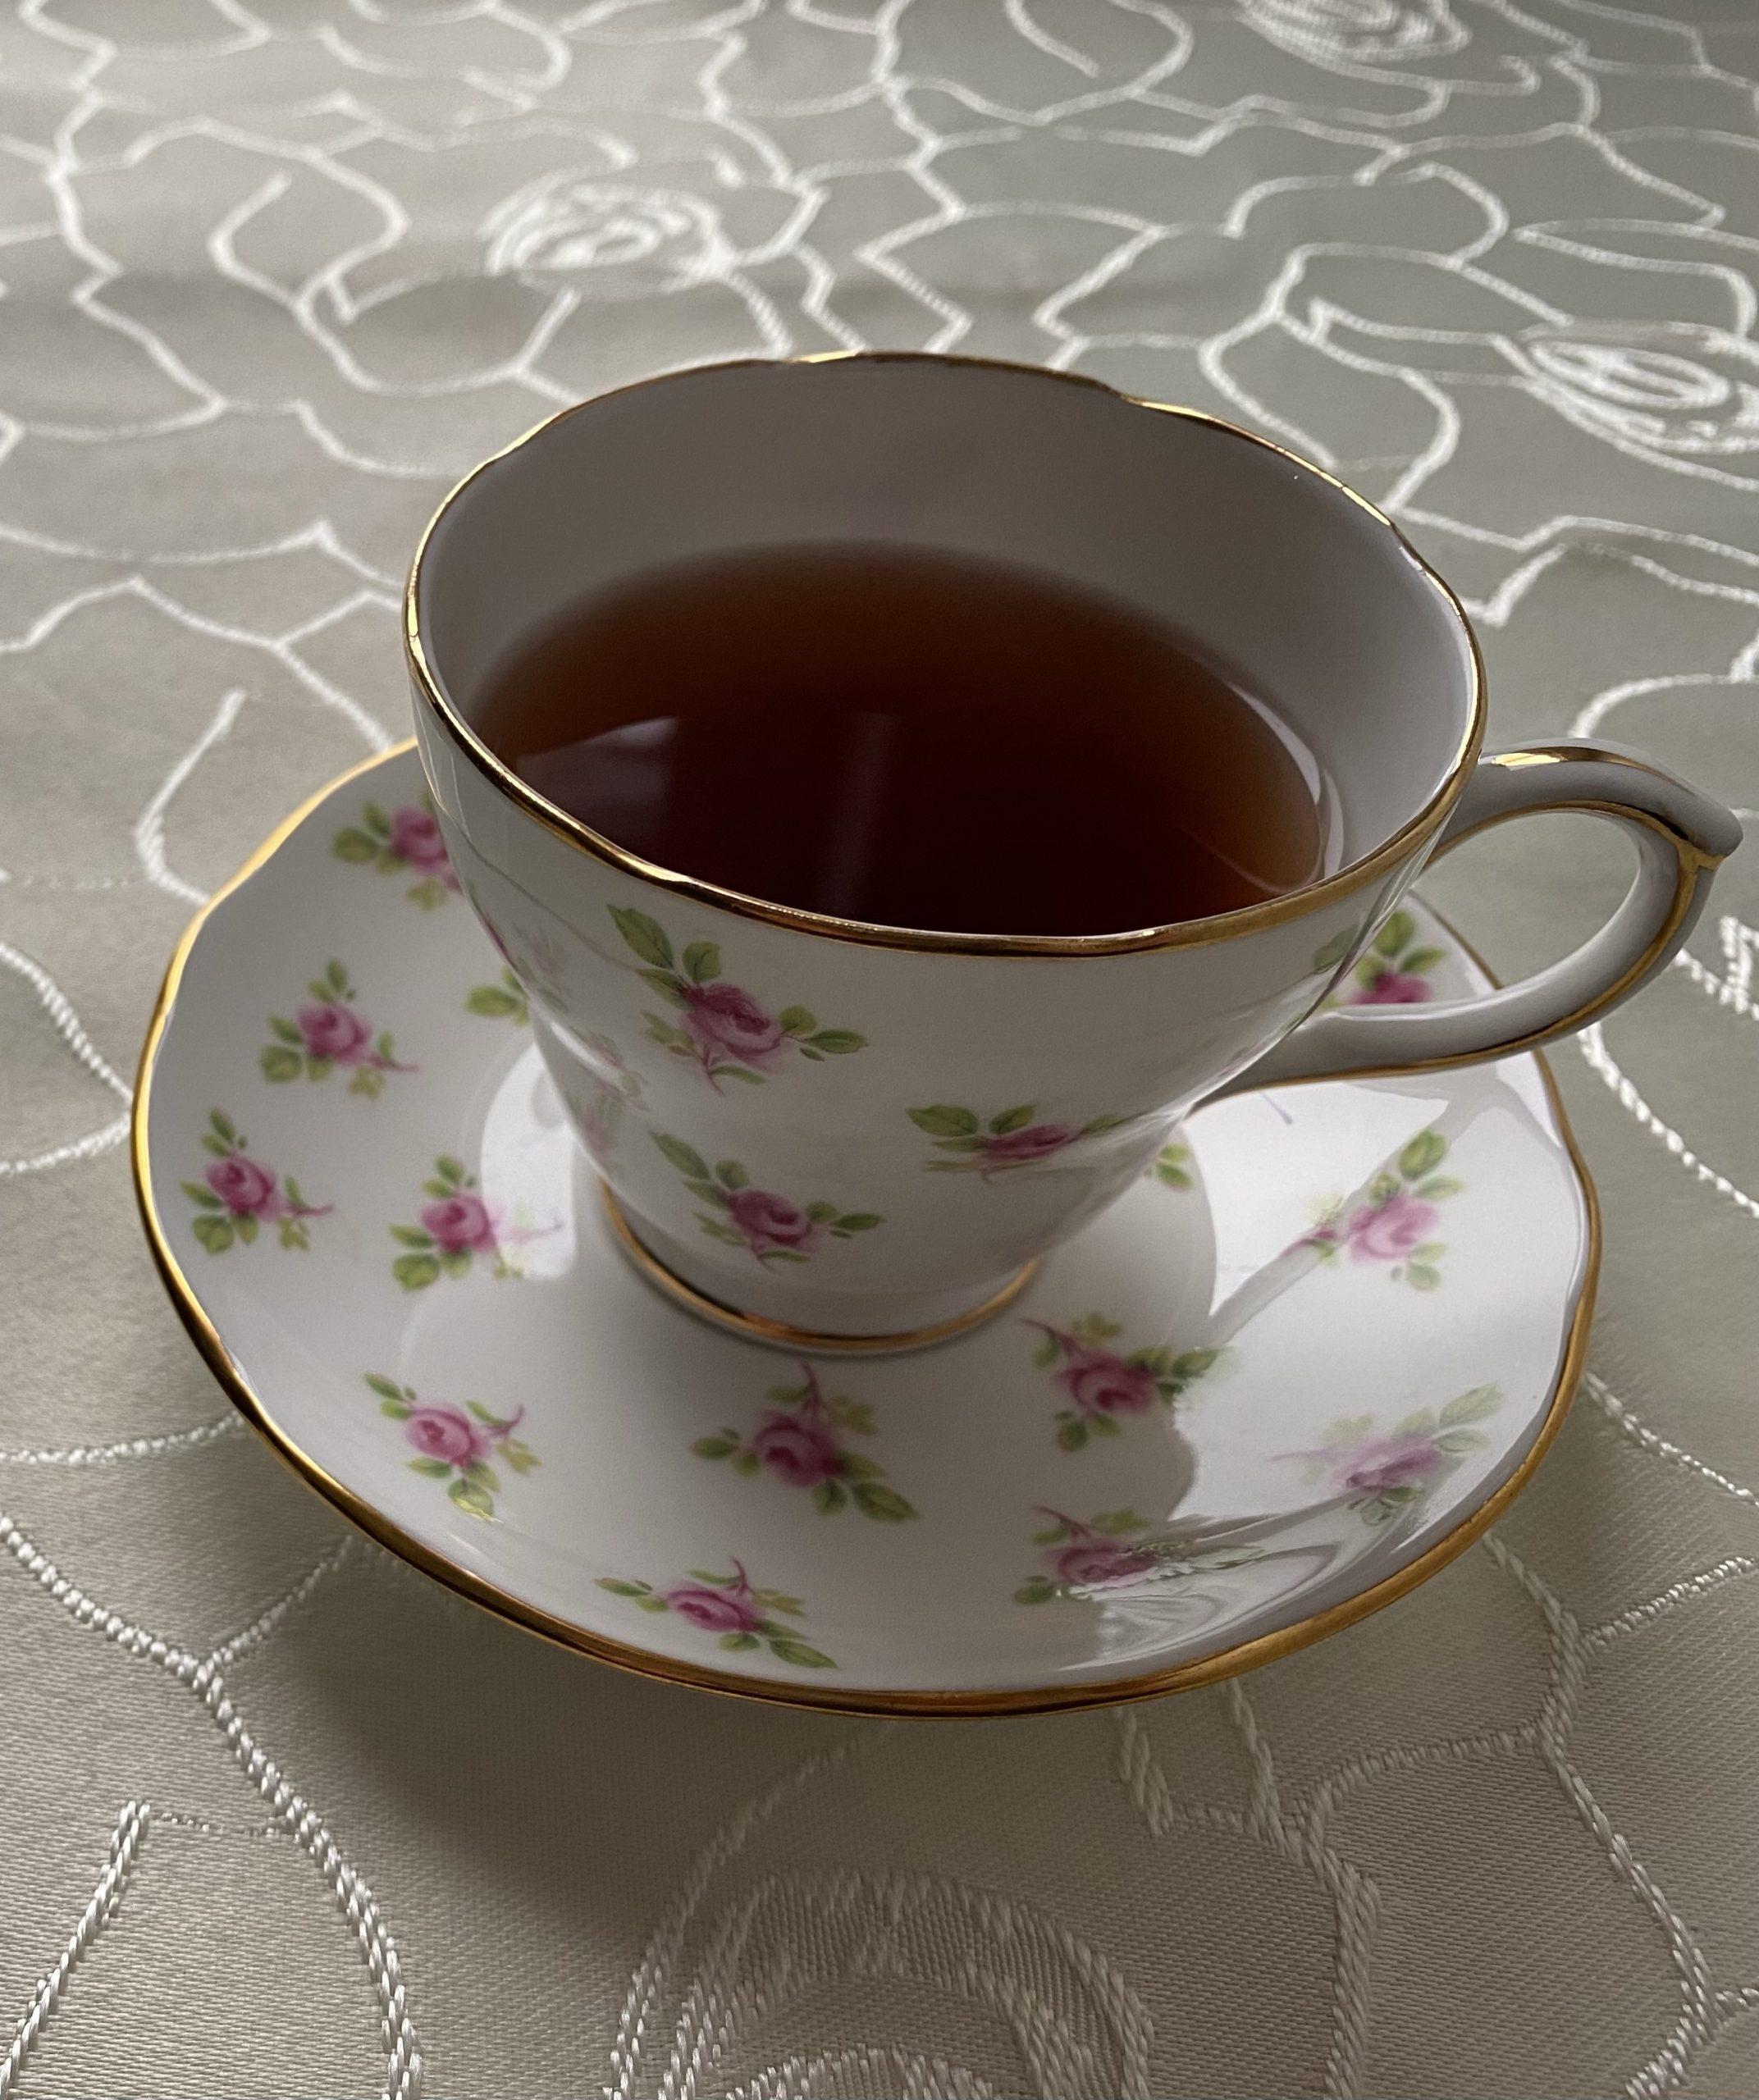 Teatime: Plum Deluxe Chocolate Hazelnut Dessert Tea